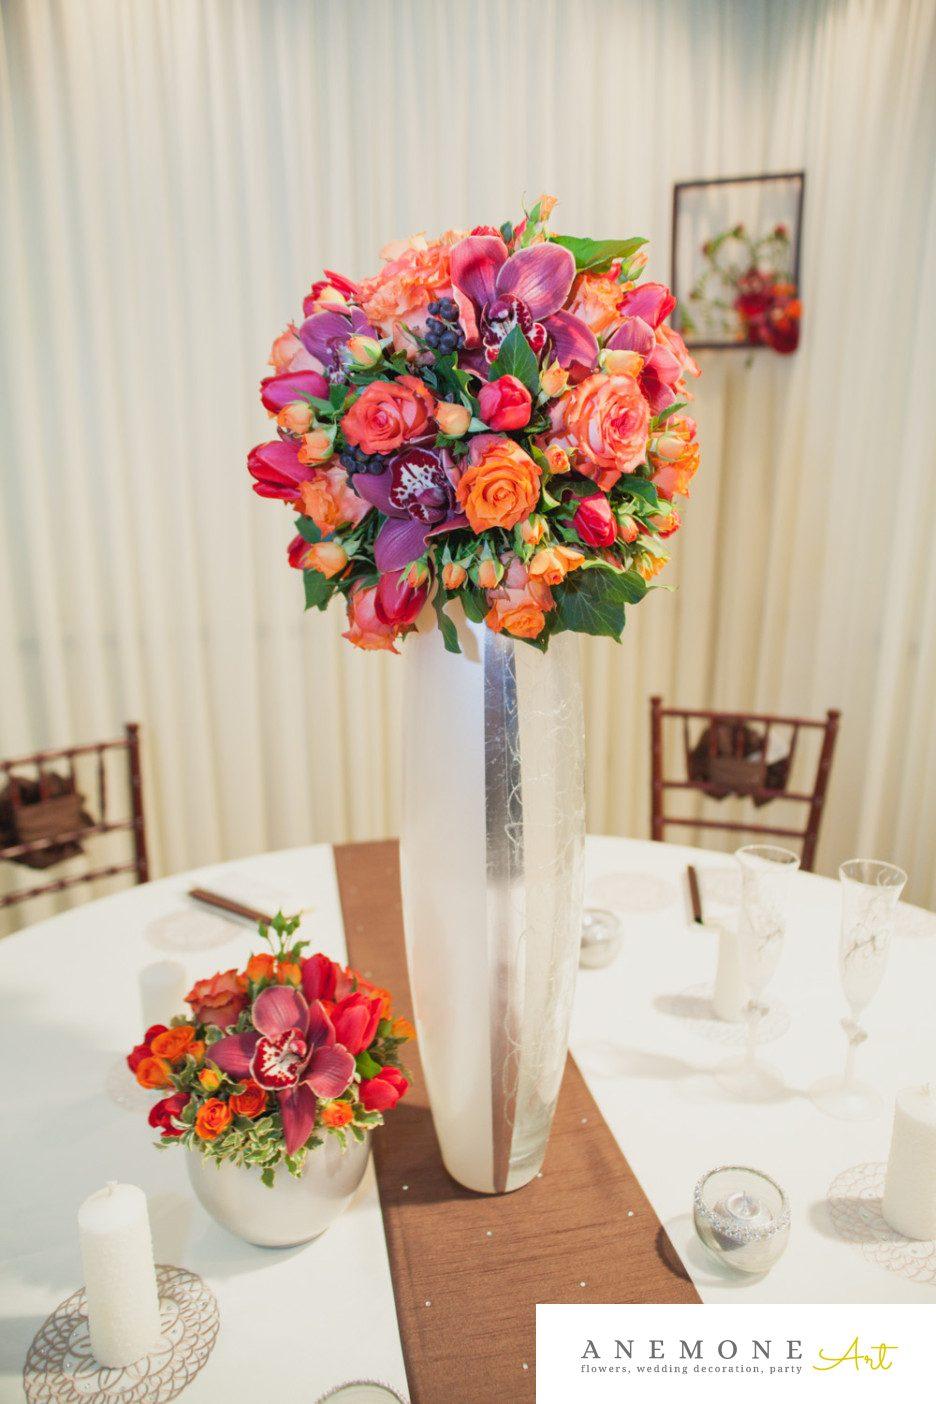 Poza, foto cu Flori de nunta cymbidium, decor masa, lalele, mini-rosa, mov, orhidee, portocaliu, rosu, trandafiri in Arad, Timisoara, Oradea (wedding flowers, bouquets) nunta Arad, Timisoara, Oradea